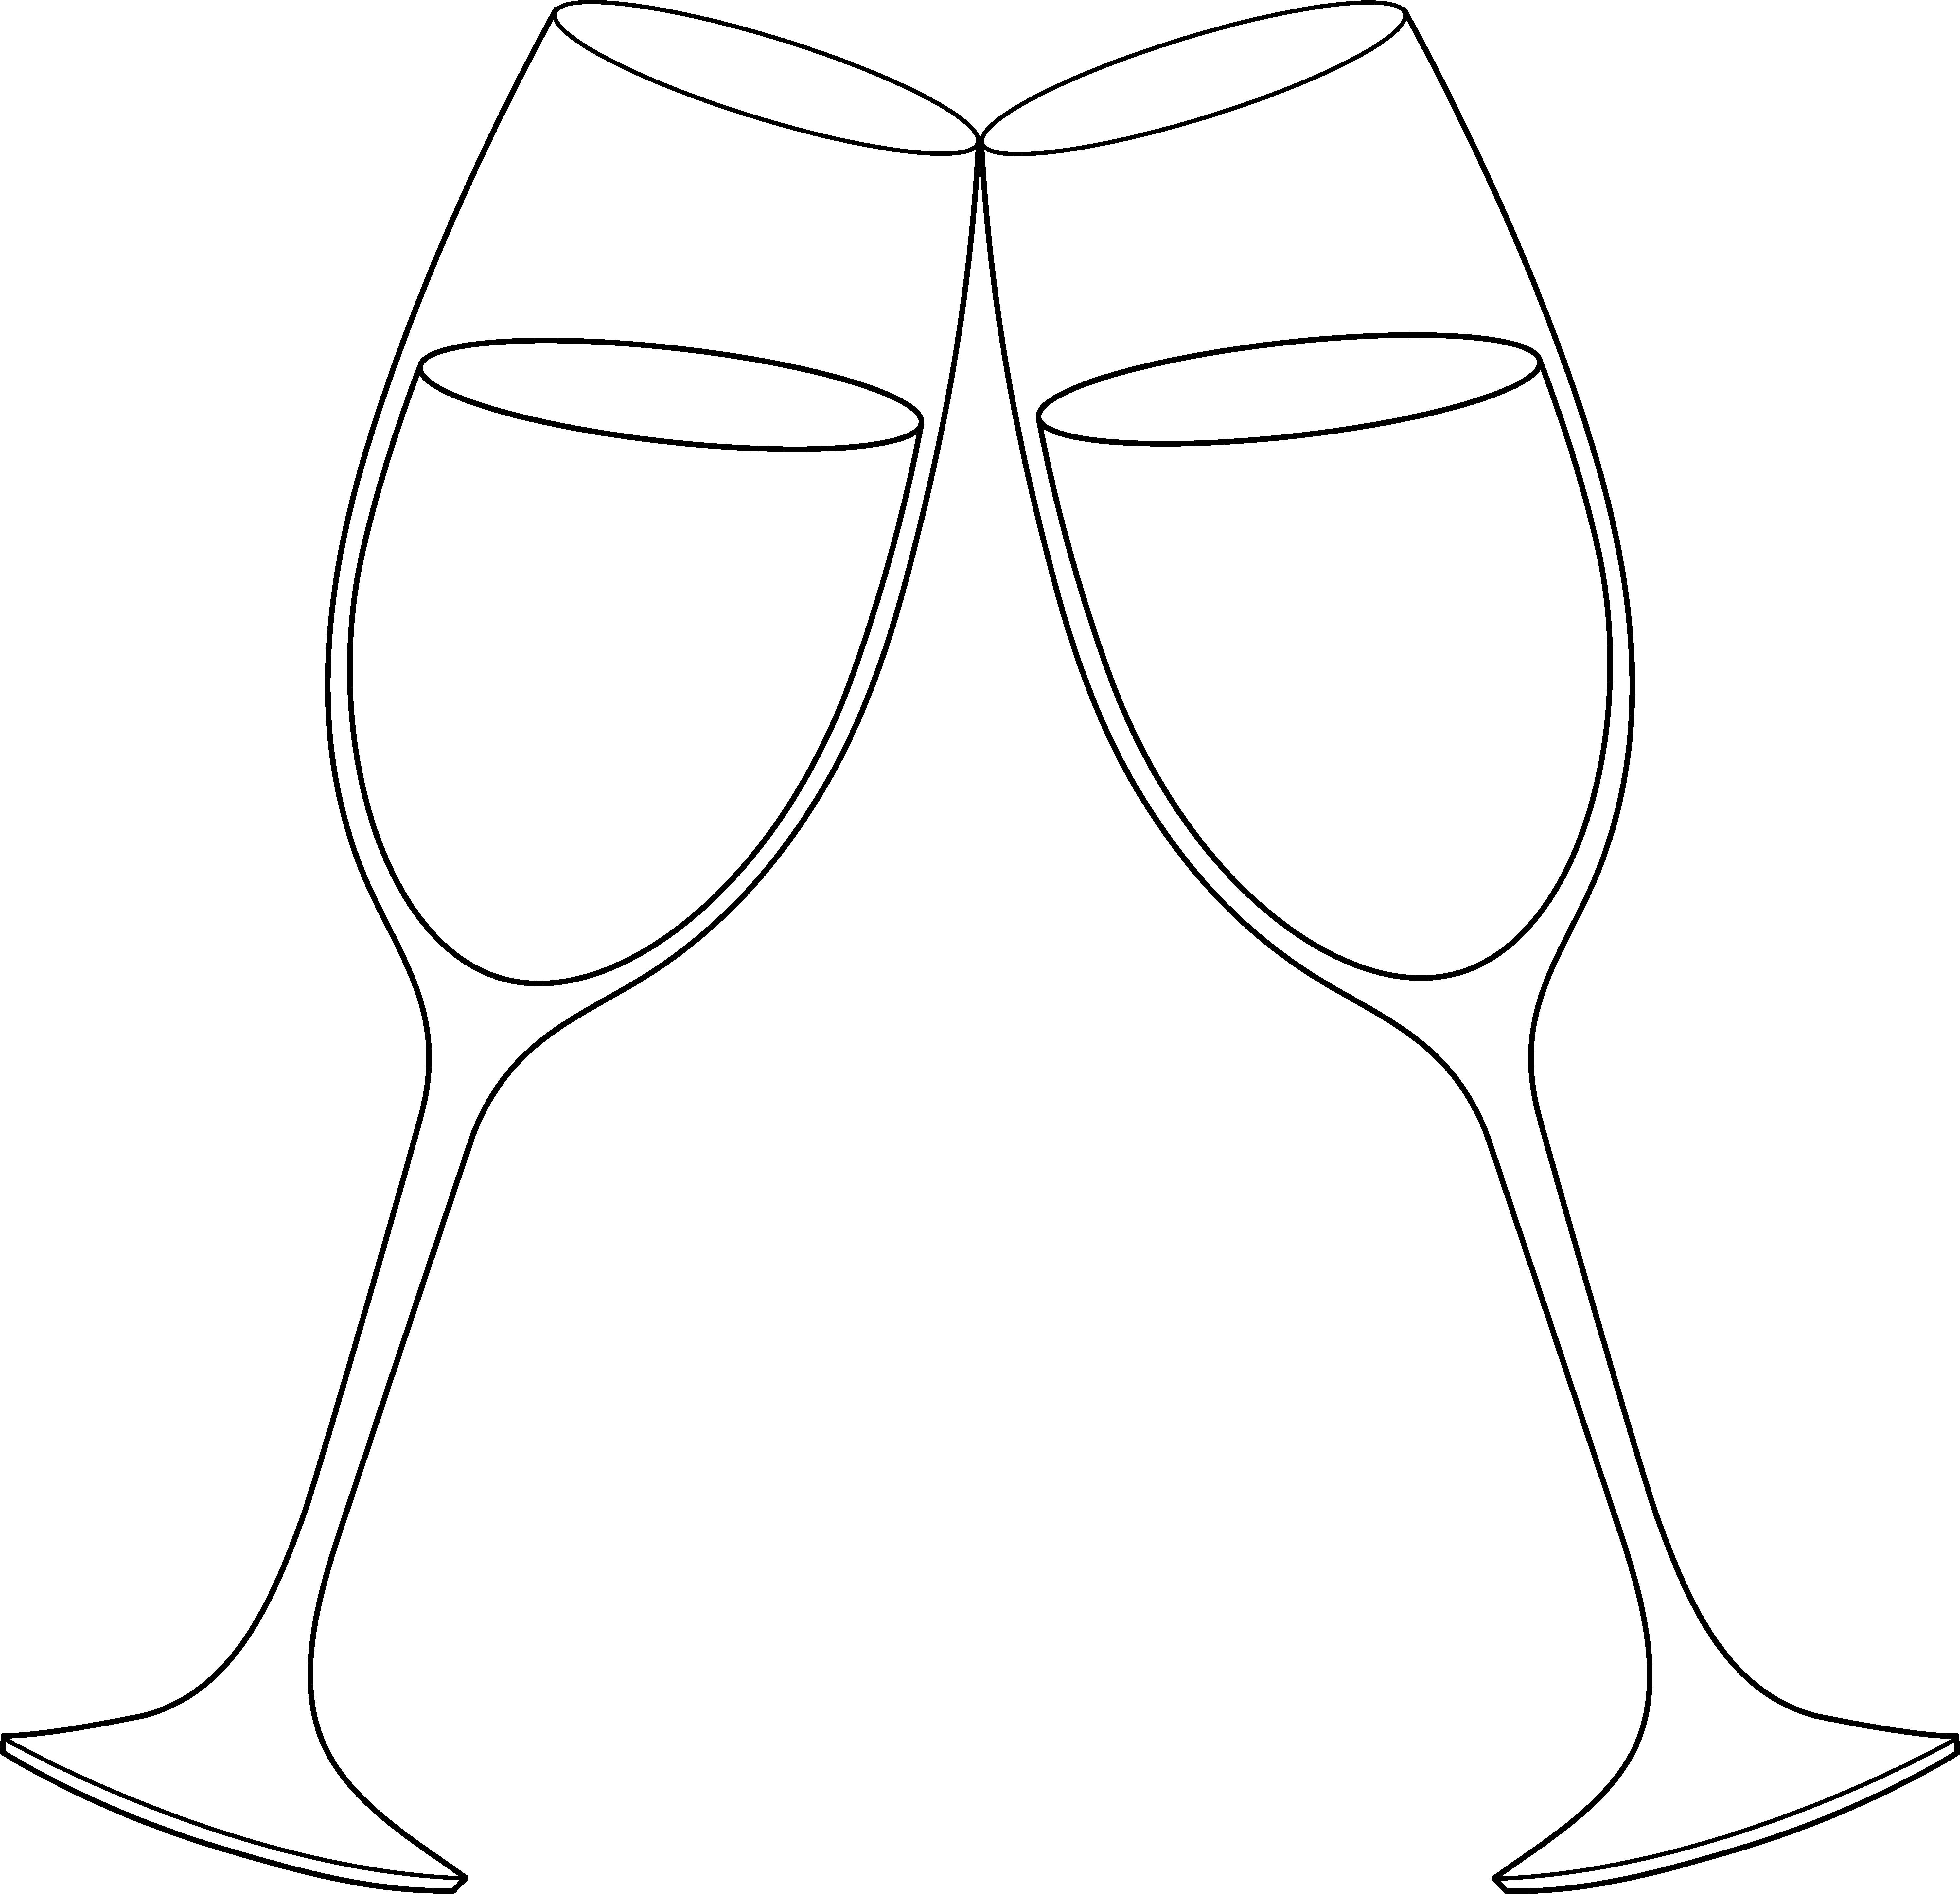 Champagne clipart black and white Glasses sunglasses%20clip%20art%20black%20and%20white glasses%20clipart · Free